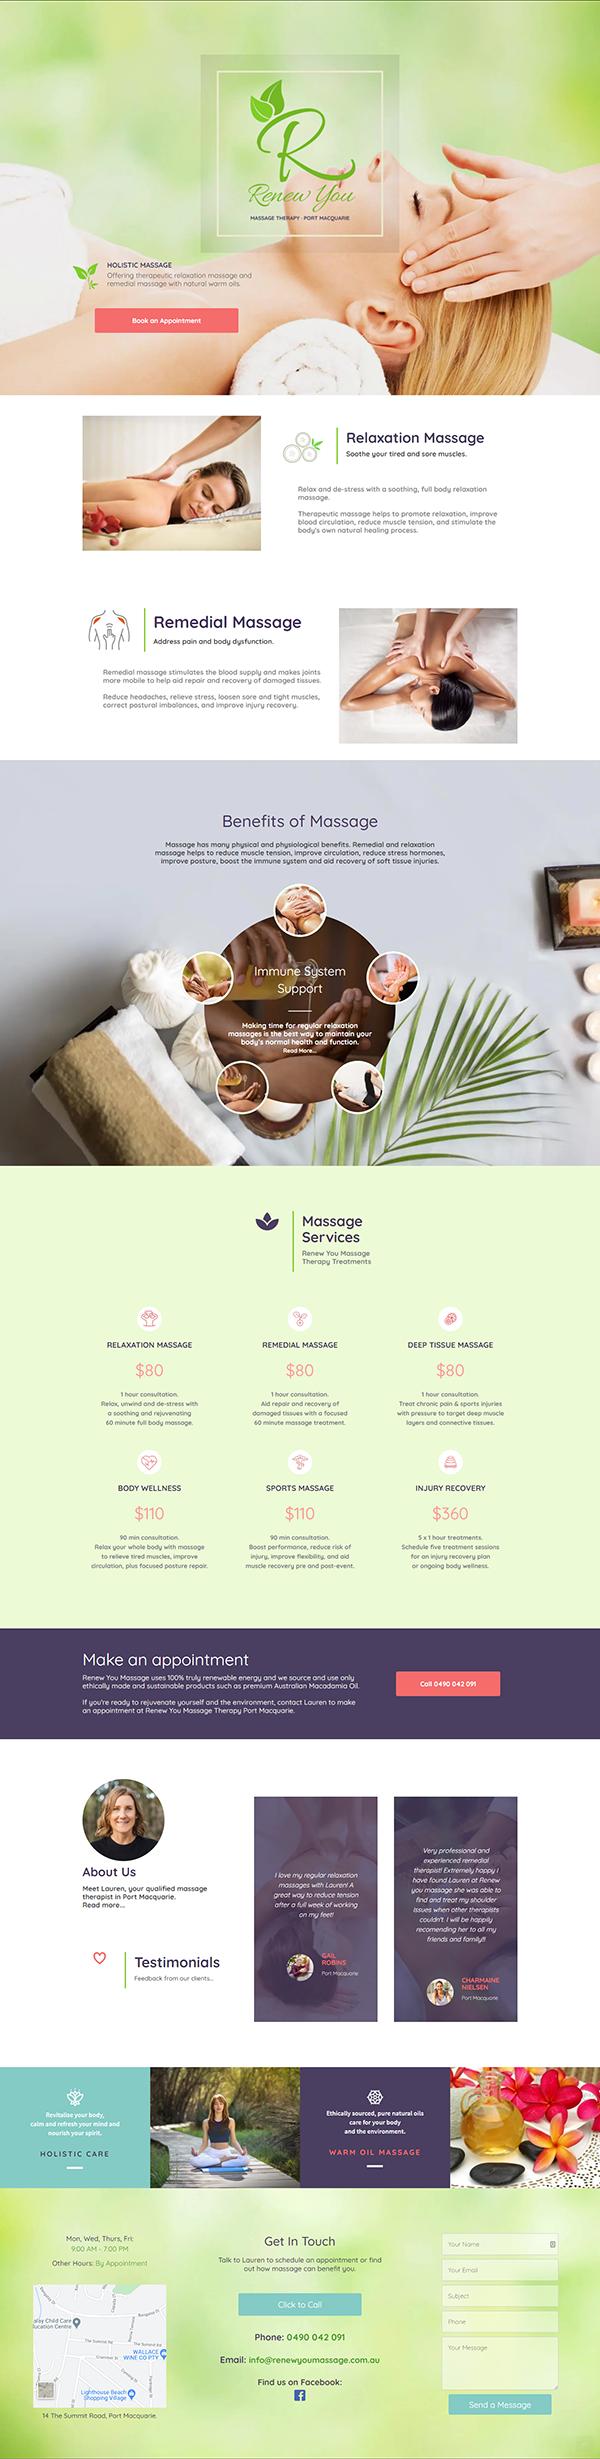 Renew You Massage Web Design Port Macquarie